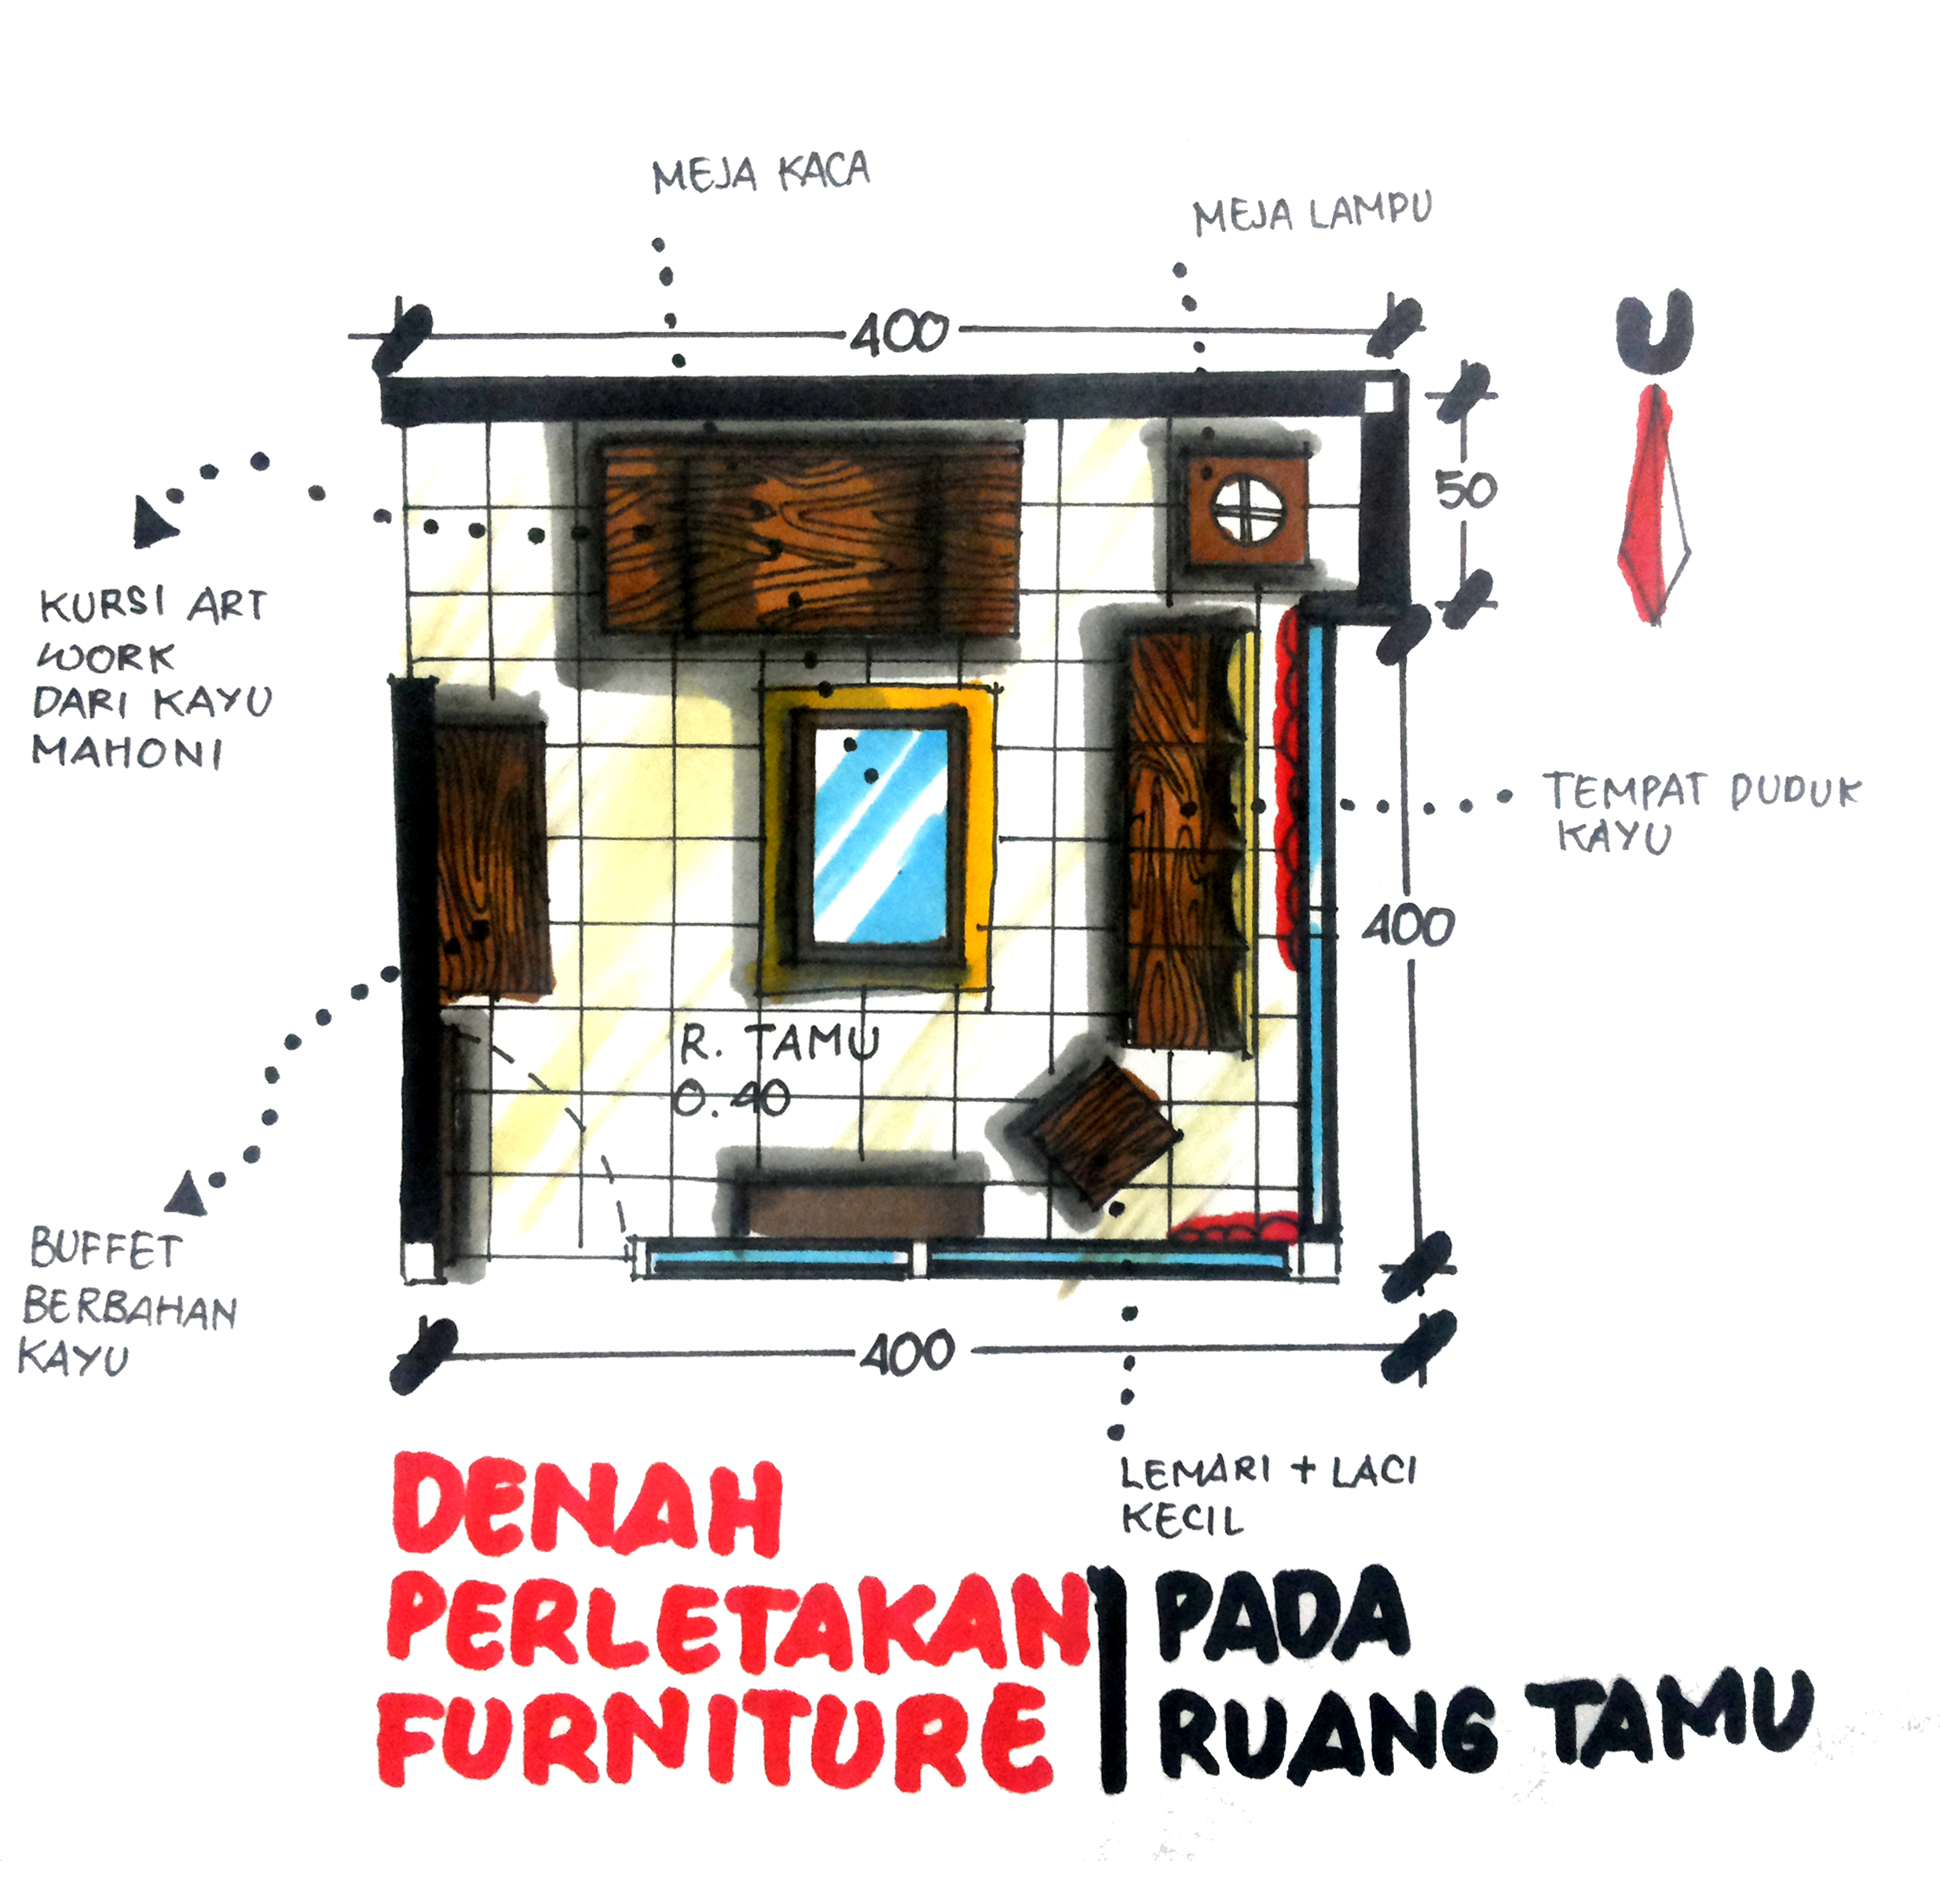 Made Agus Putra Wijaya  1219251053  Arsitektur Udayana